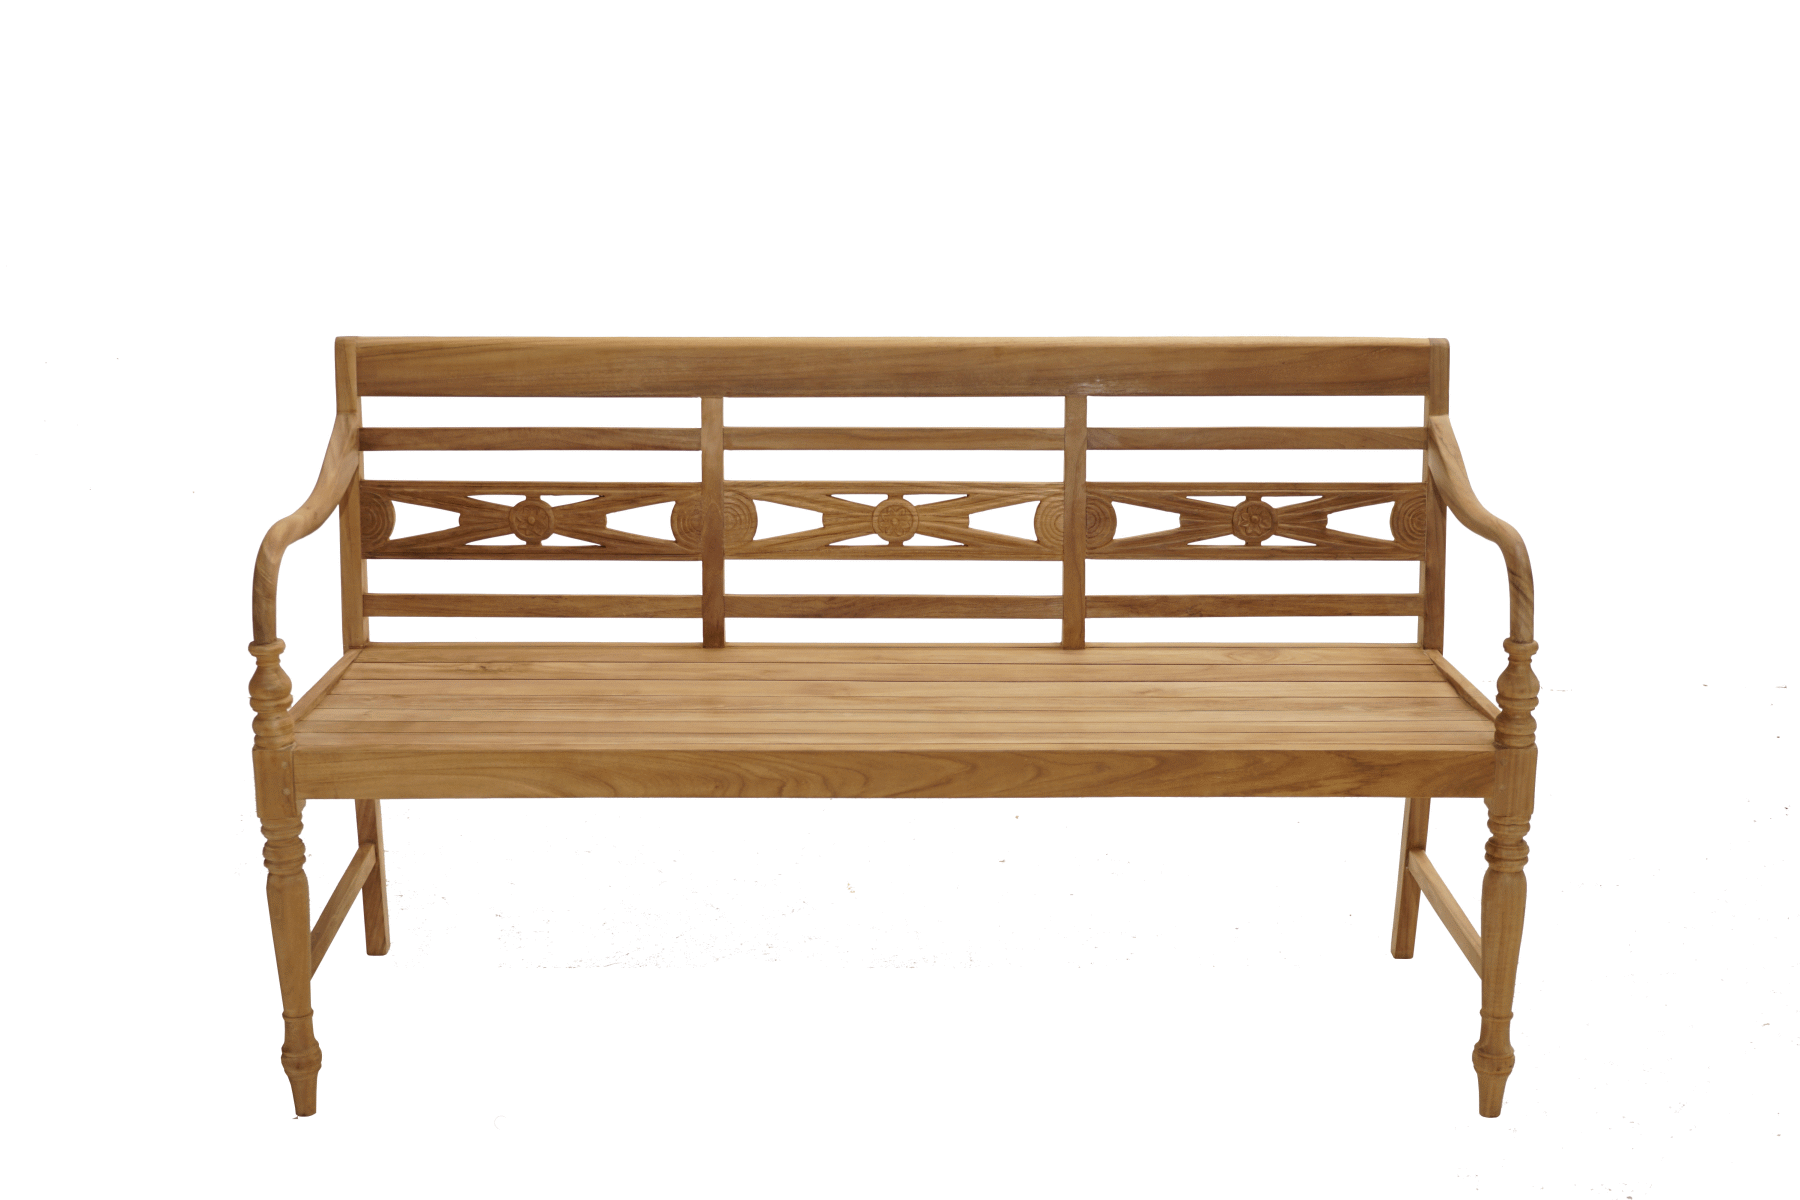 bank cambridge 150cm teak svlk zertifiziert cambridge. Black Bedroom Furniture Sets. Home Design Ideas